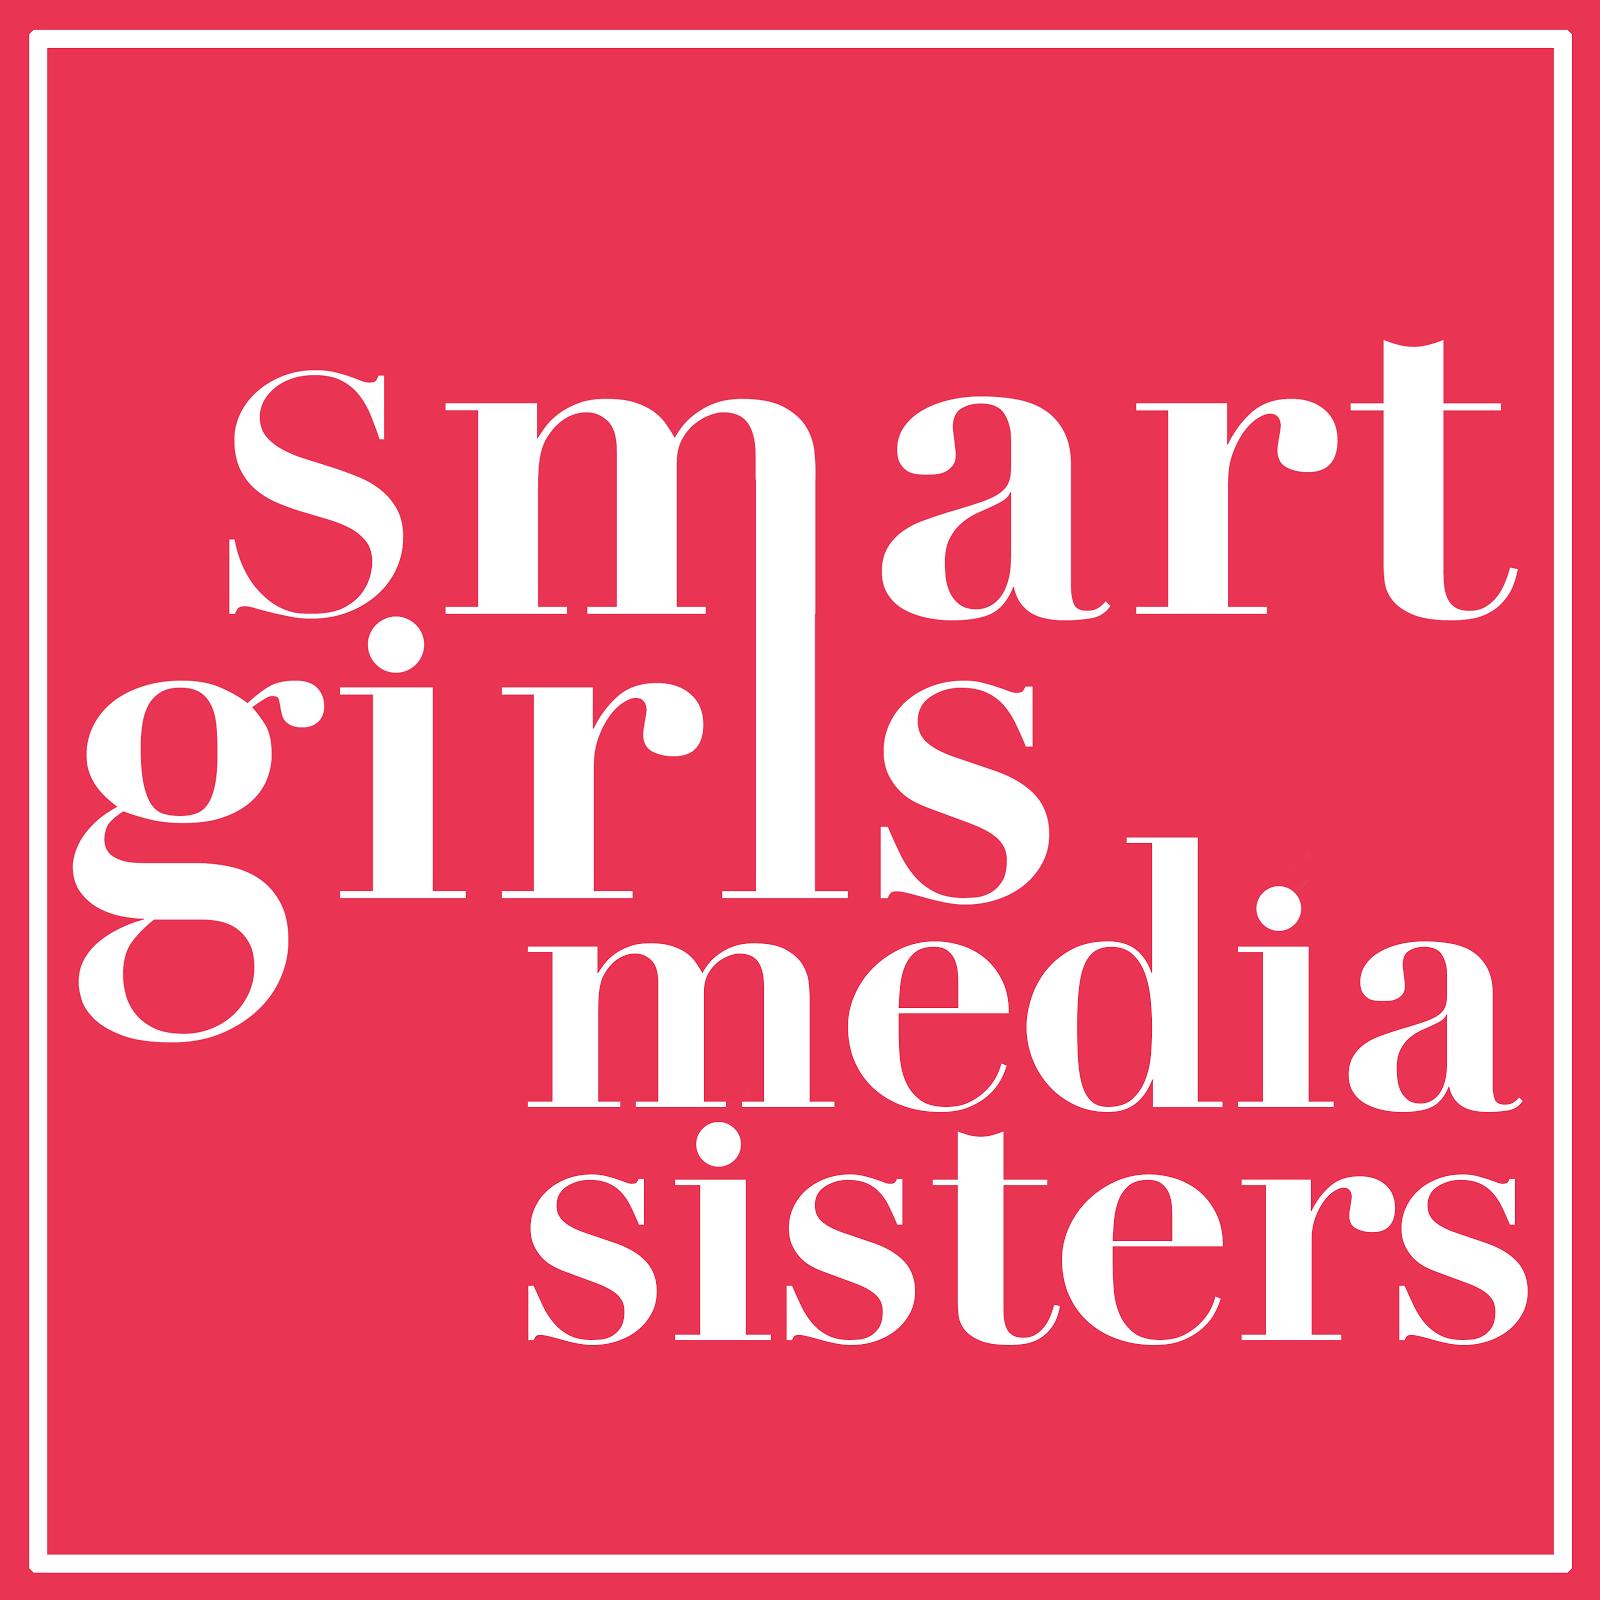 Smart Girls Media Sisters